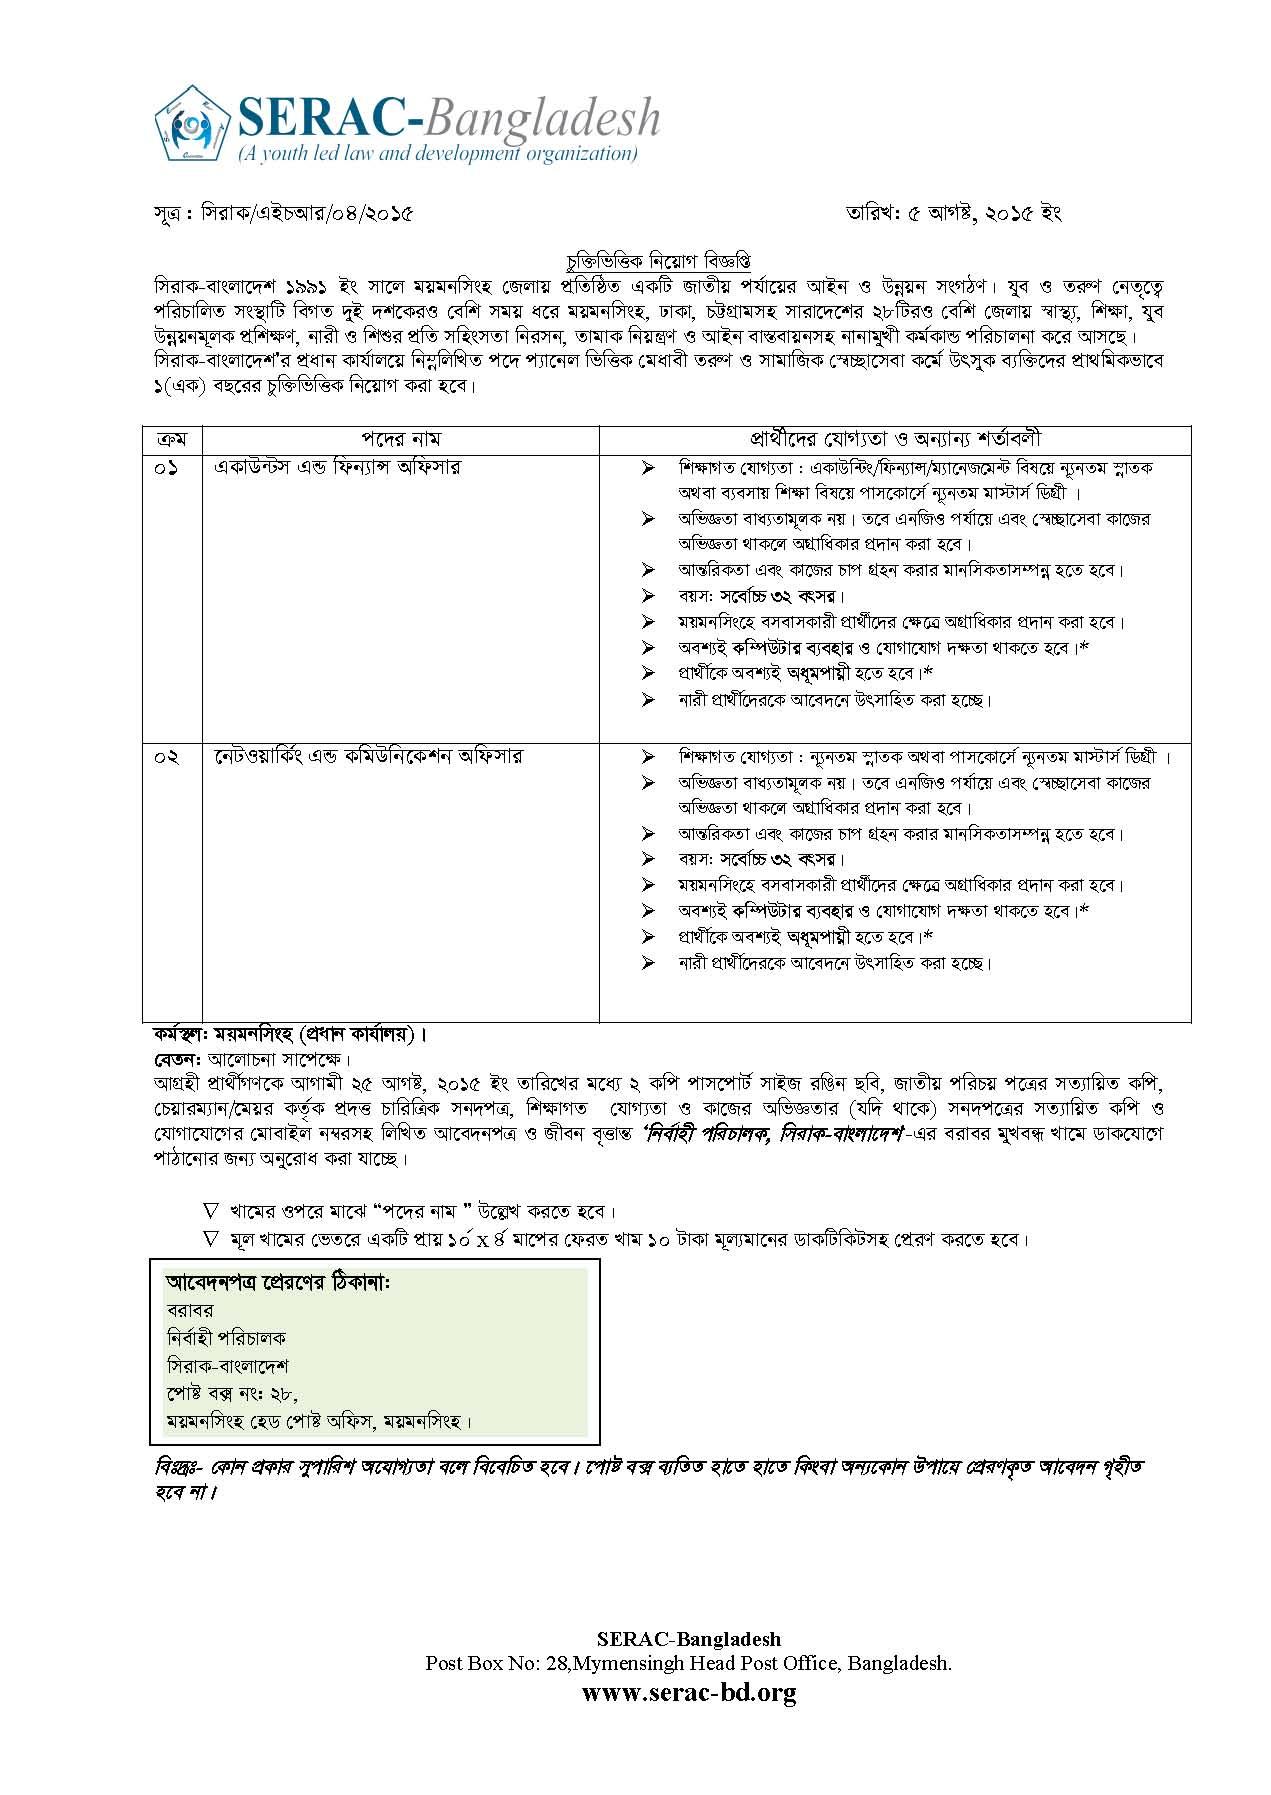 Circular communication & finance officer